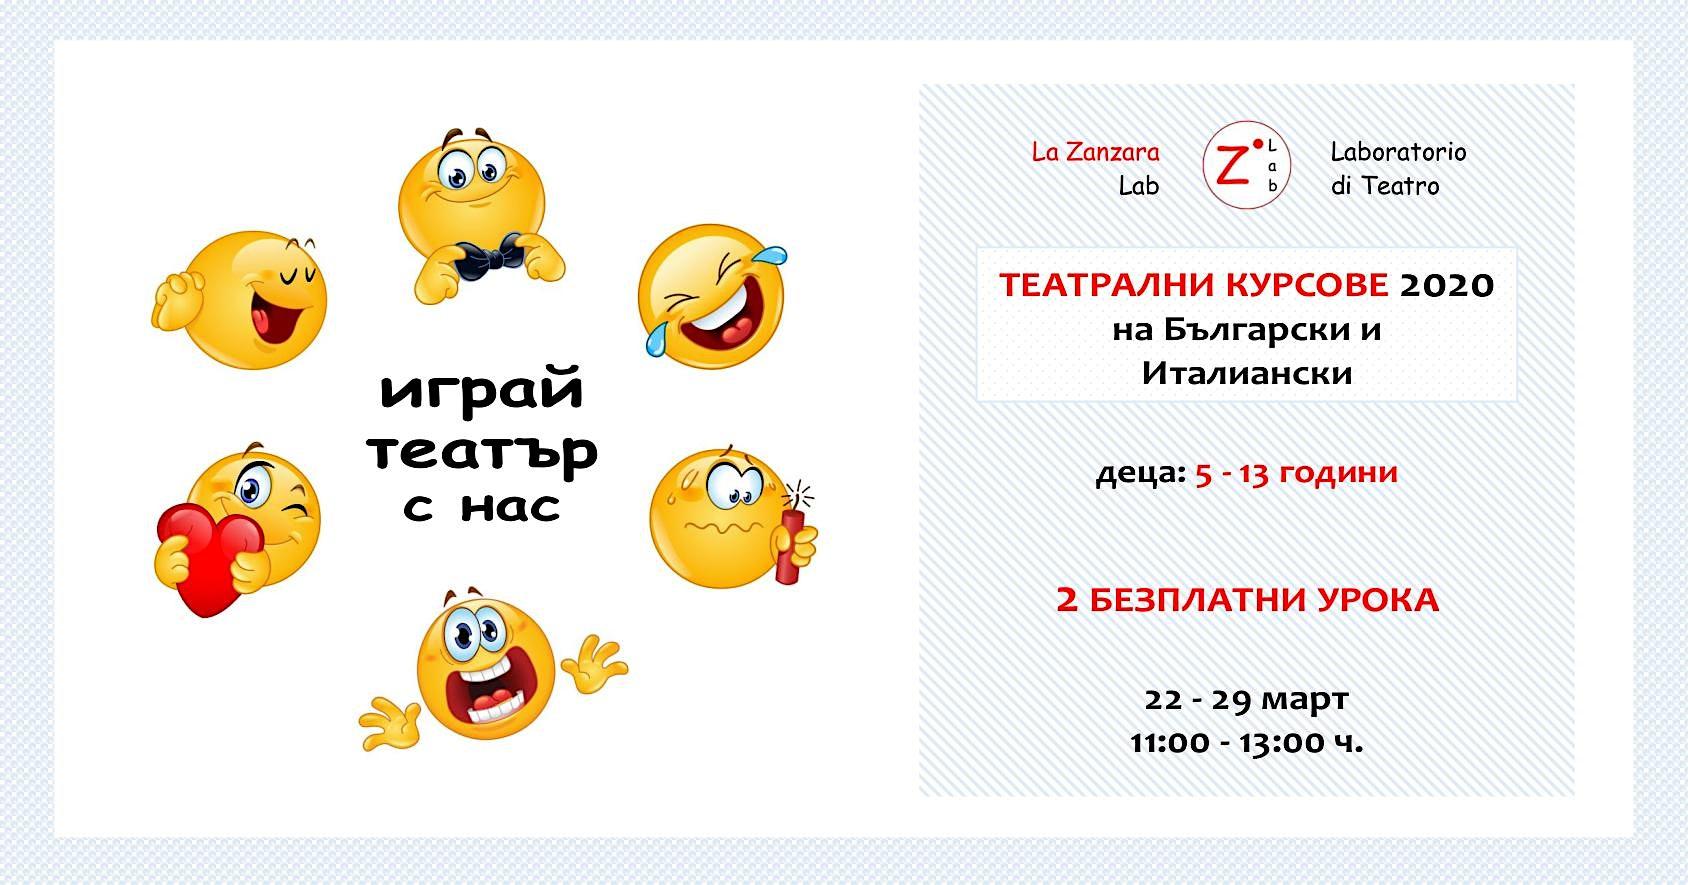 Театрален курс - ИГРАЙ ТЕАТЪР С НАС - FA' TEATRO CON NOI